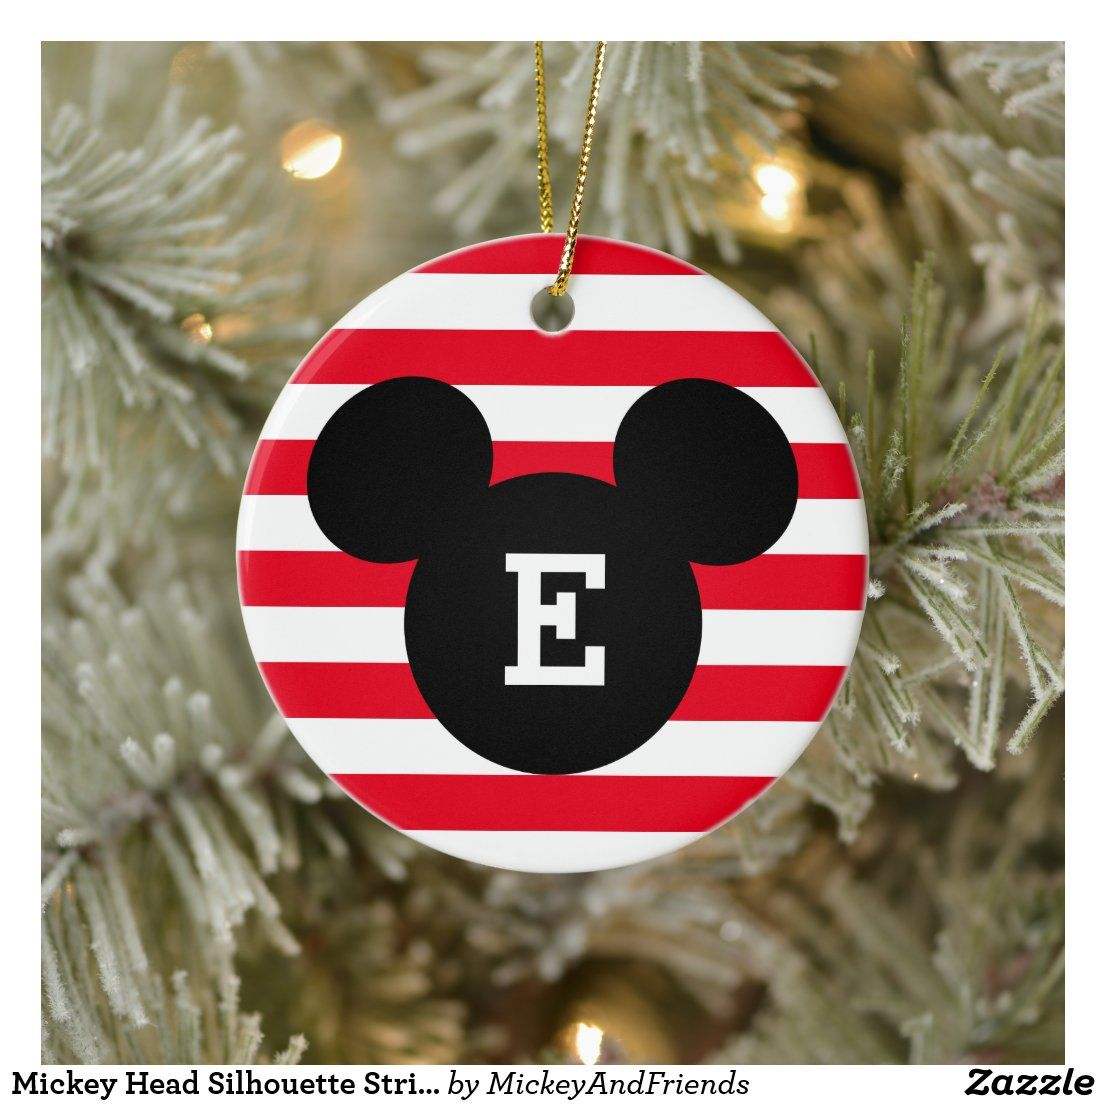 Mickey Head Silhouette Striped Pattern Monogram Ceramic Ornament Zazzle Com In 2021 Disney Ornaments Diy Disney Christmas Decorations Diy Xmas Ornaments